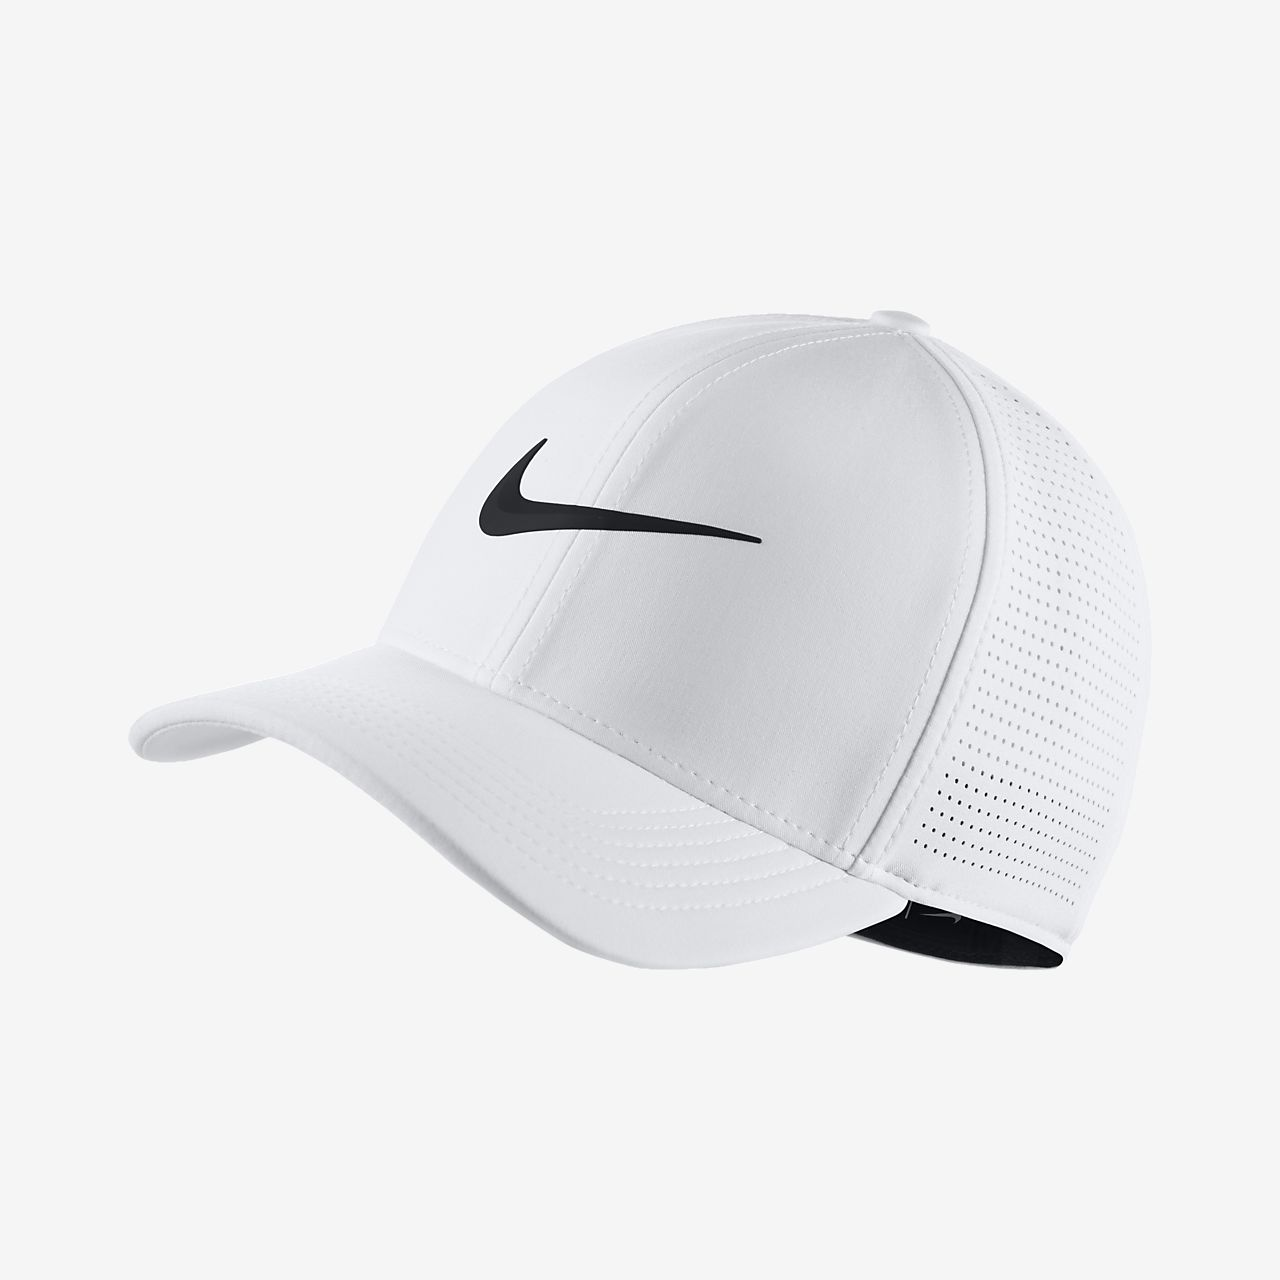 52aa0e4fdc5 Nike AeroBill Classic 99 Nauwsluitende golfpet. Nike.com BE